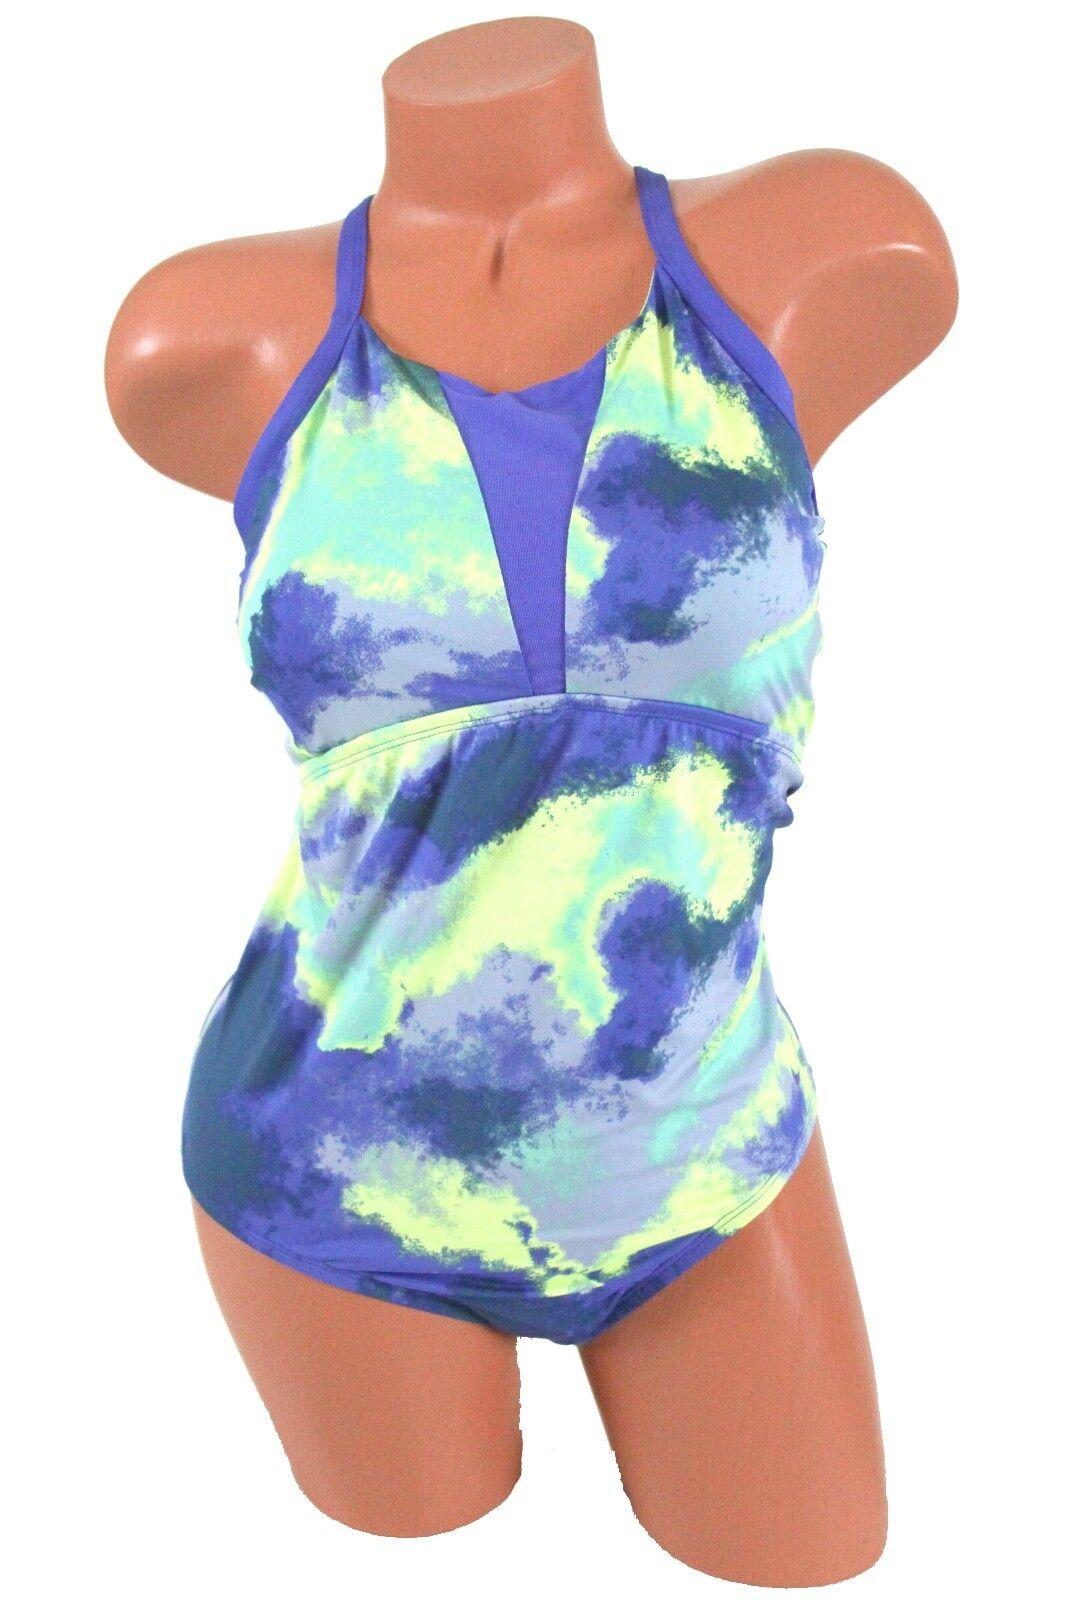 581c42d6e3e Buy Nike Active Cascade High Neck Racerback Blue One Piece Swimsuit ...